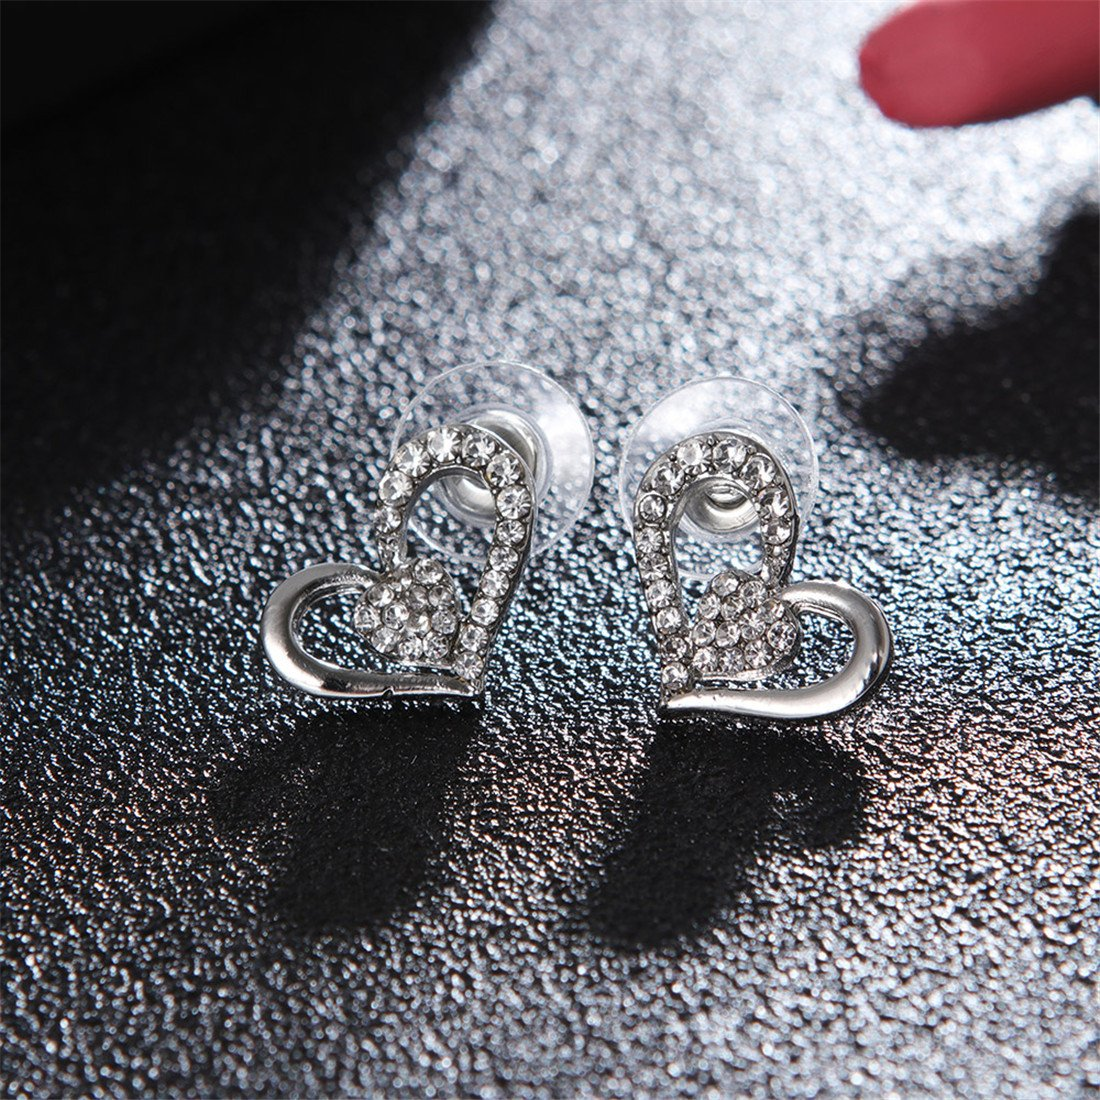 Szolno Pendant Necklace Heart Shape Jewelry Set